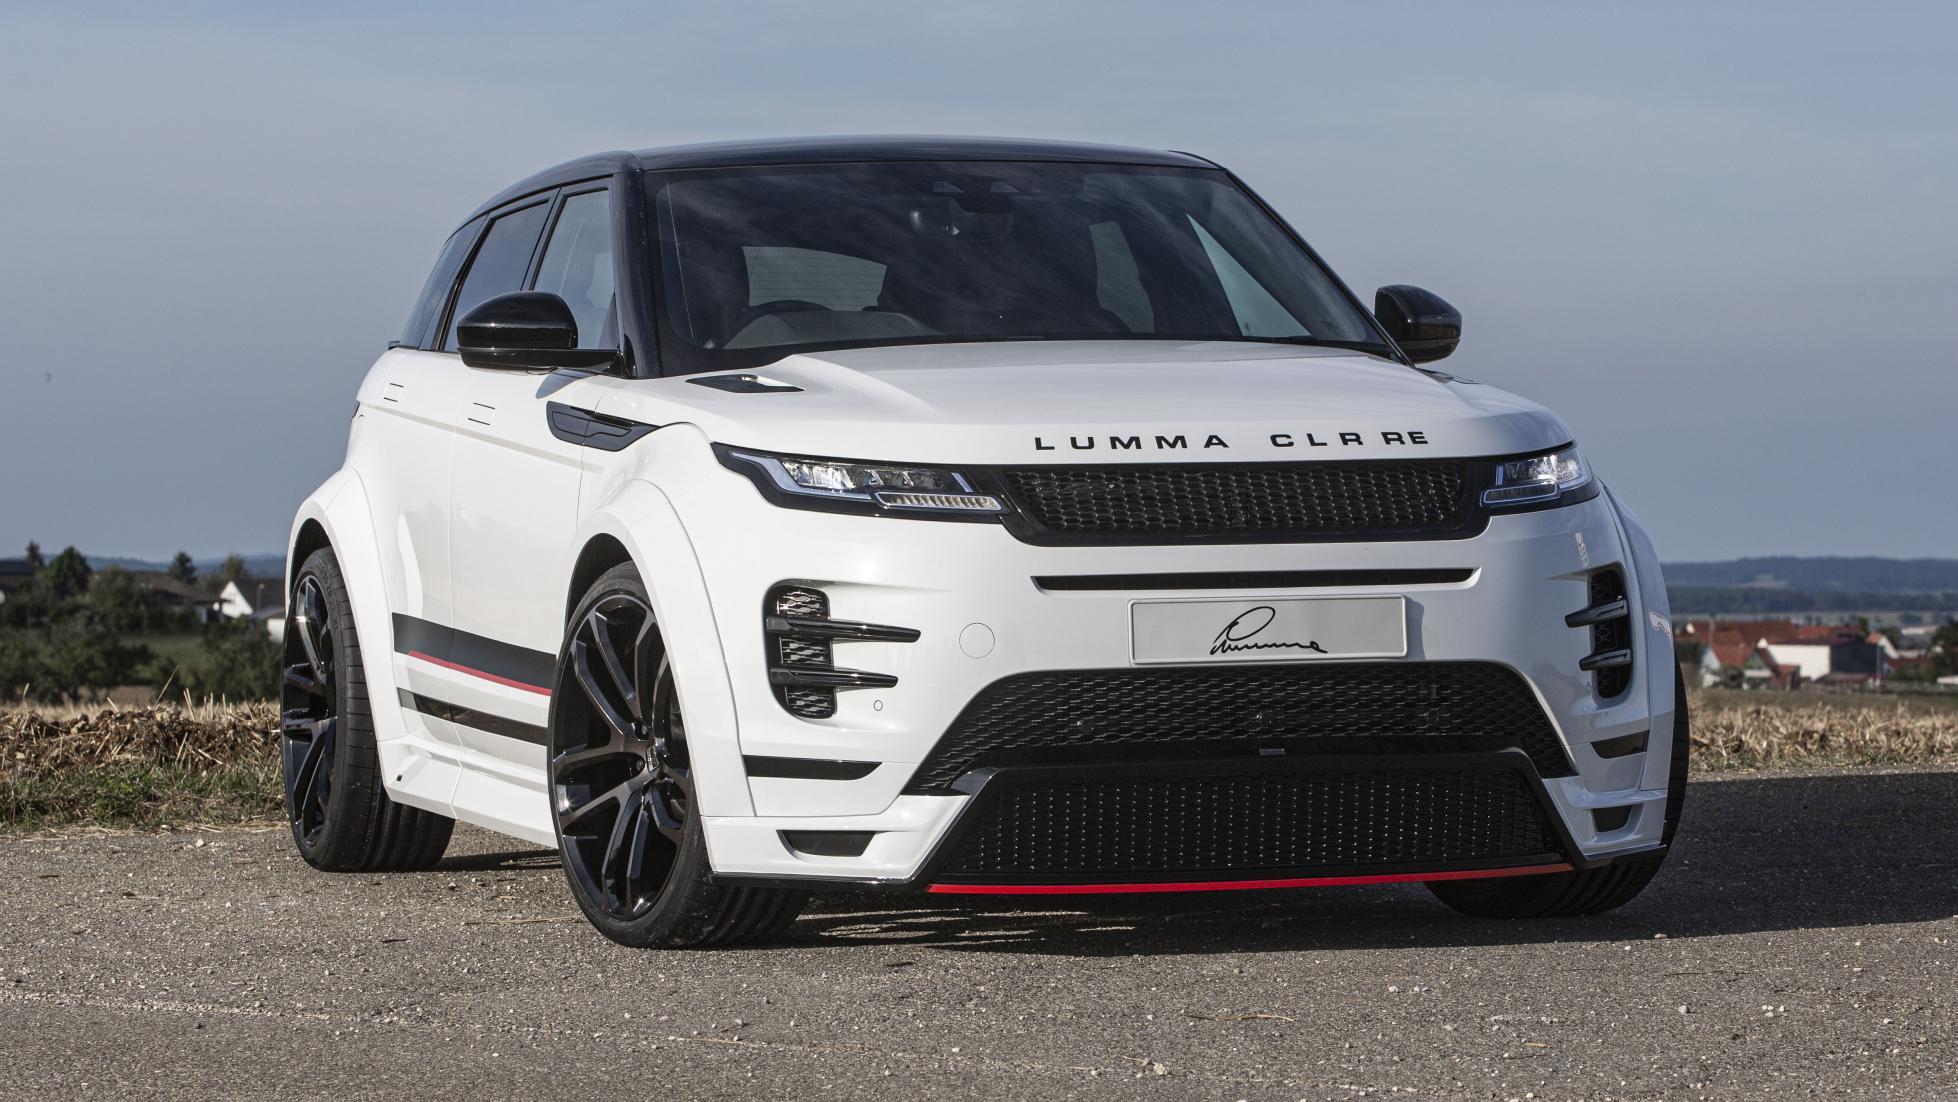 Range-Rover-Evoque-by-Lumma-Design-8